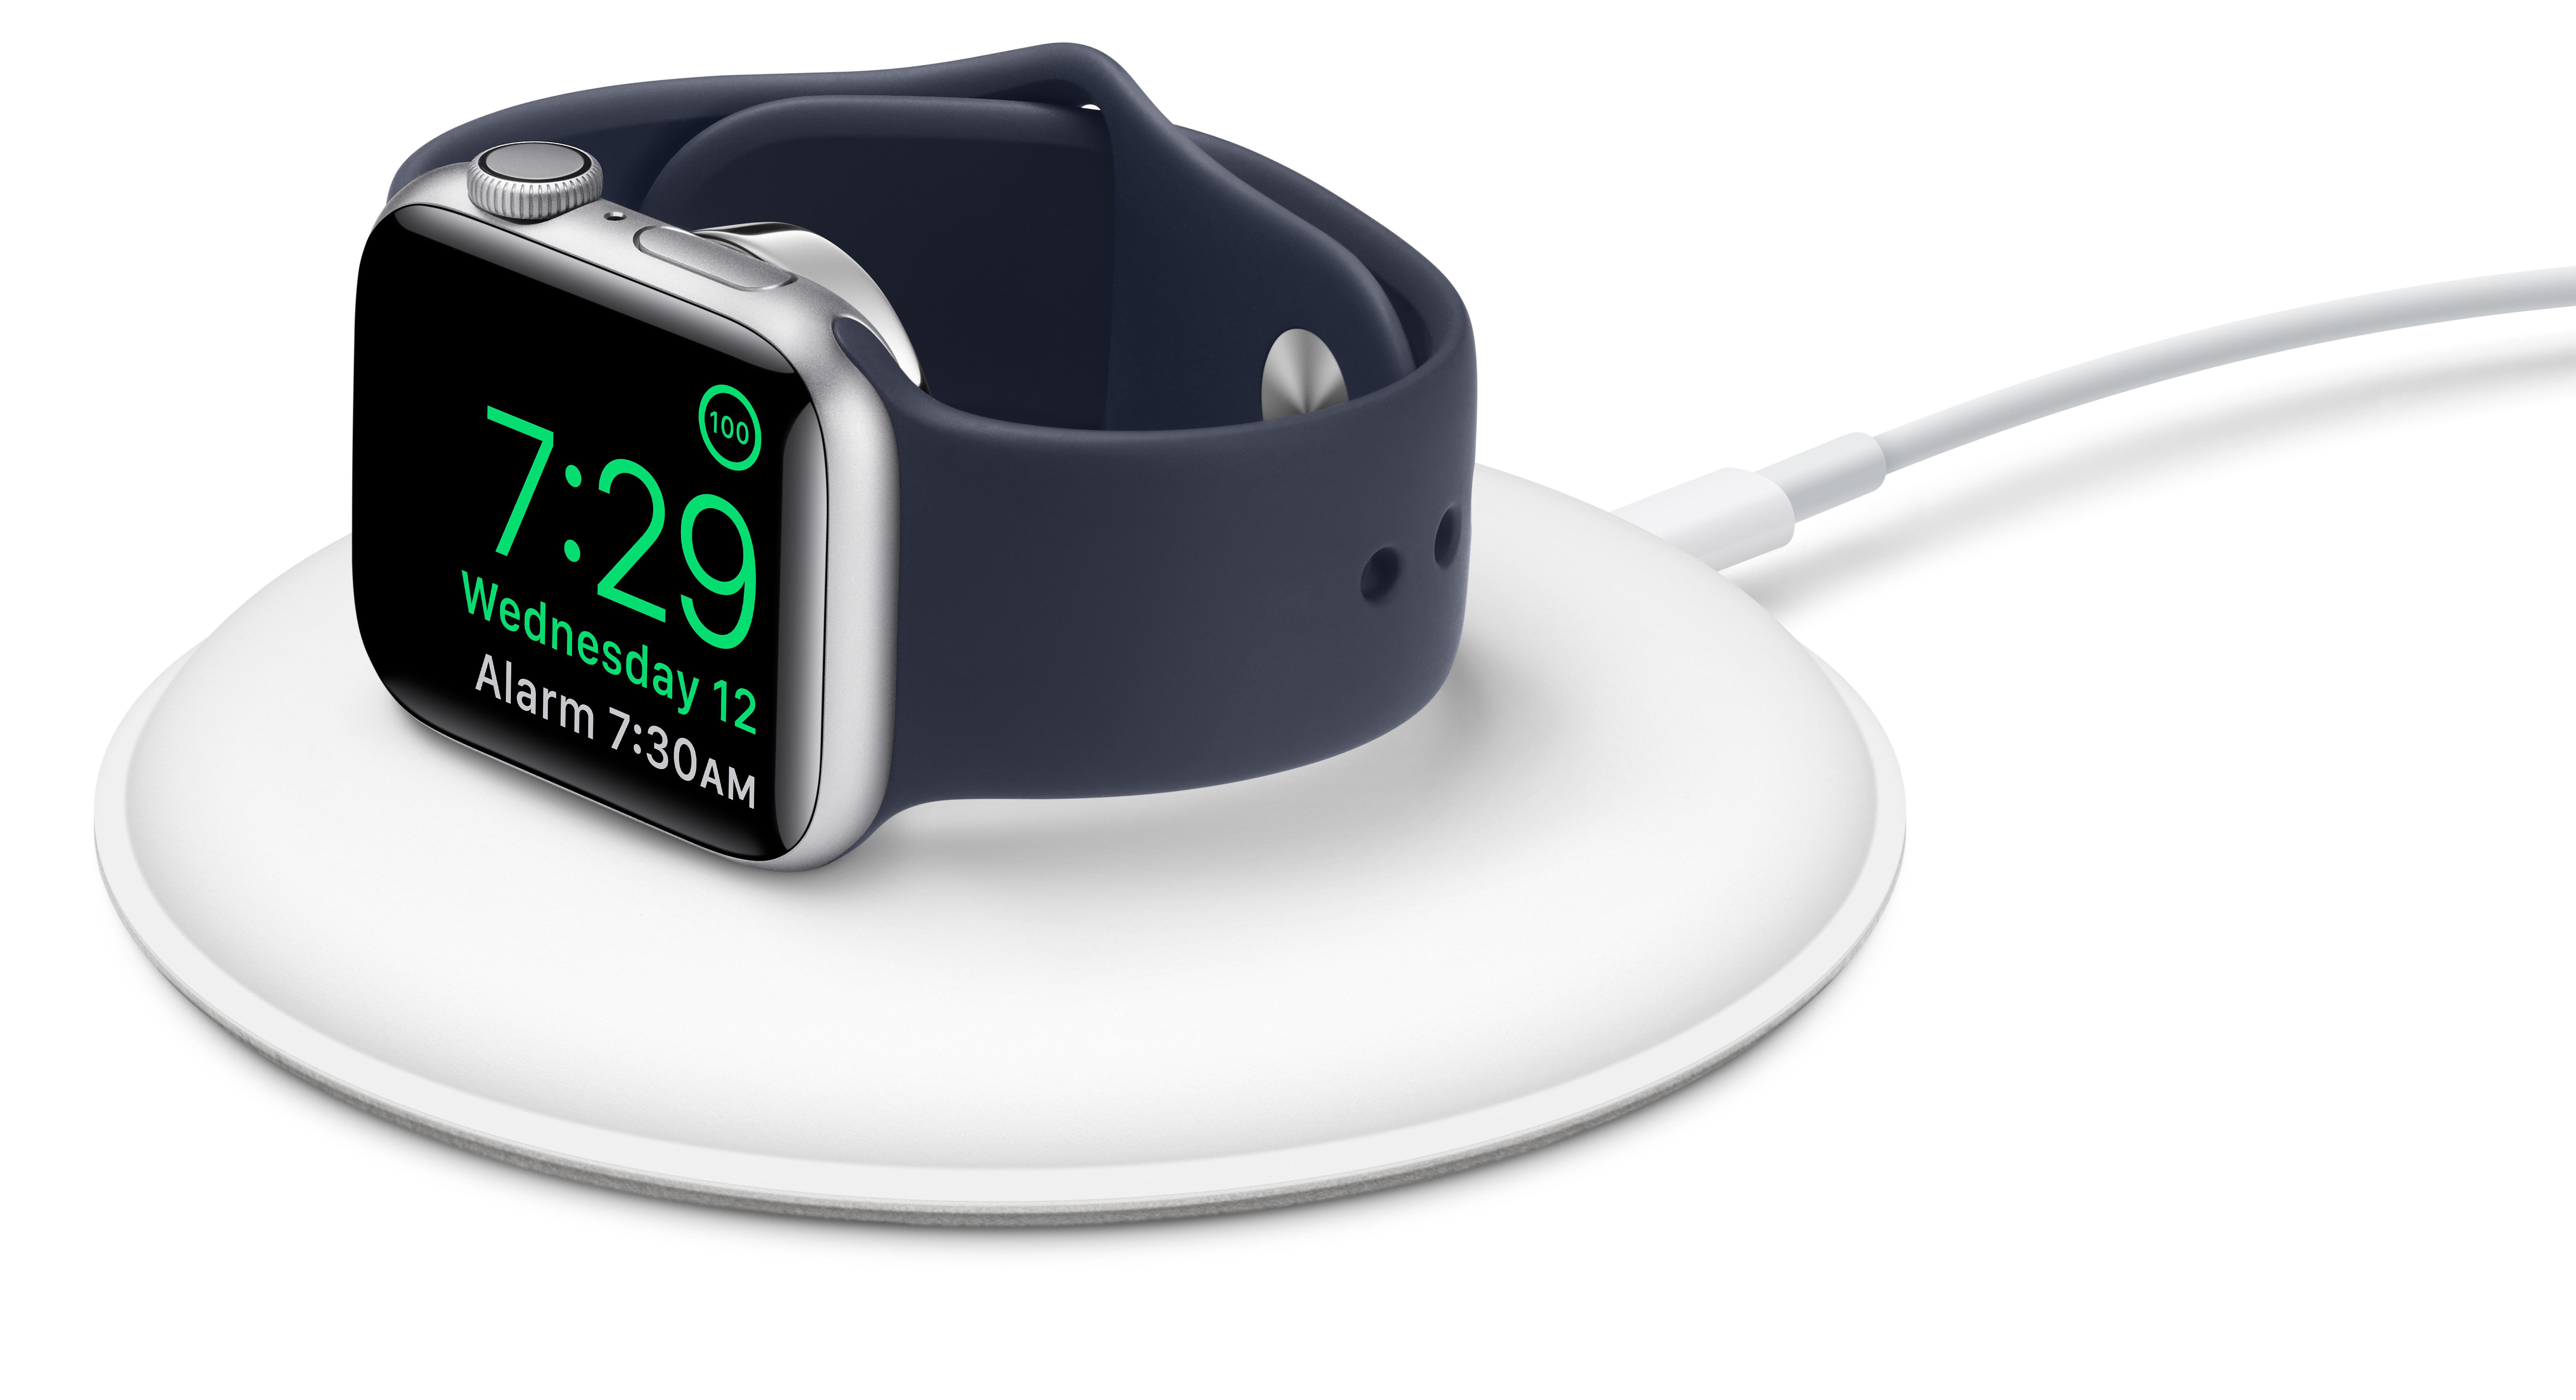 Kabel Apple Watch Series 4 Kabellose Ladegeräte Watch